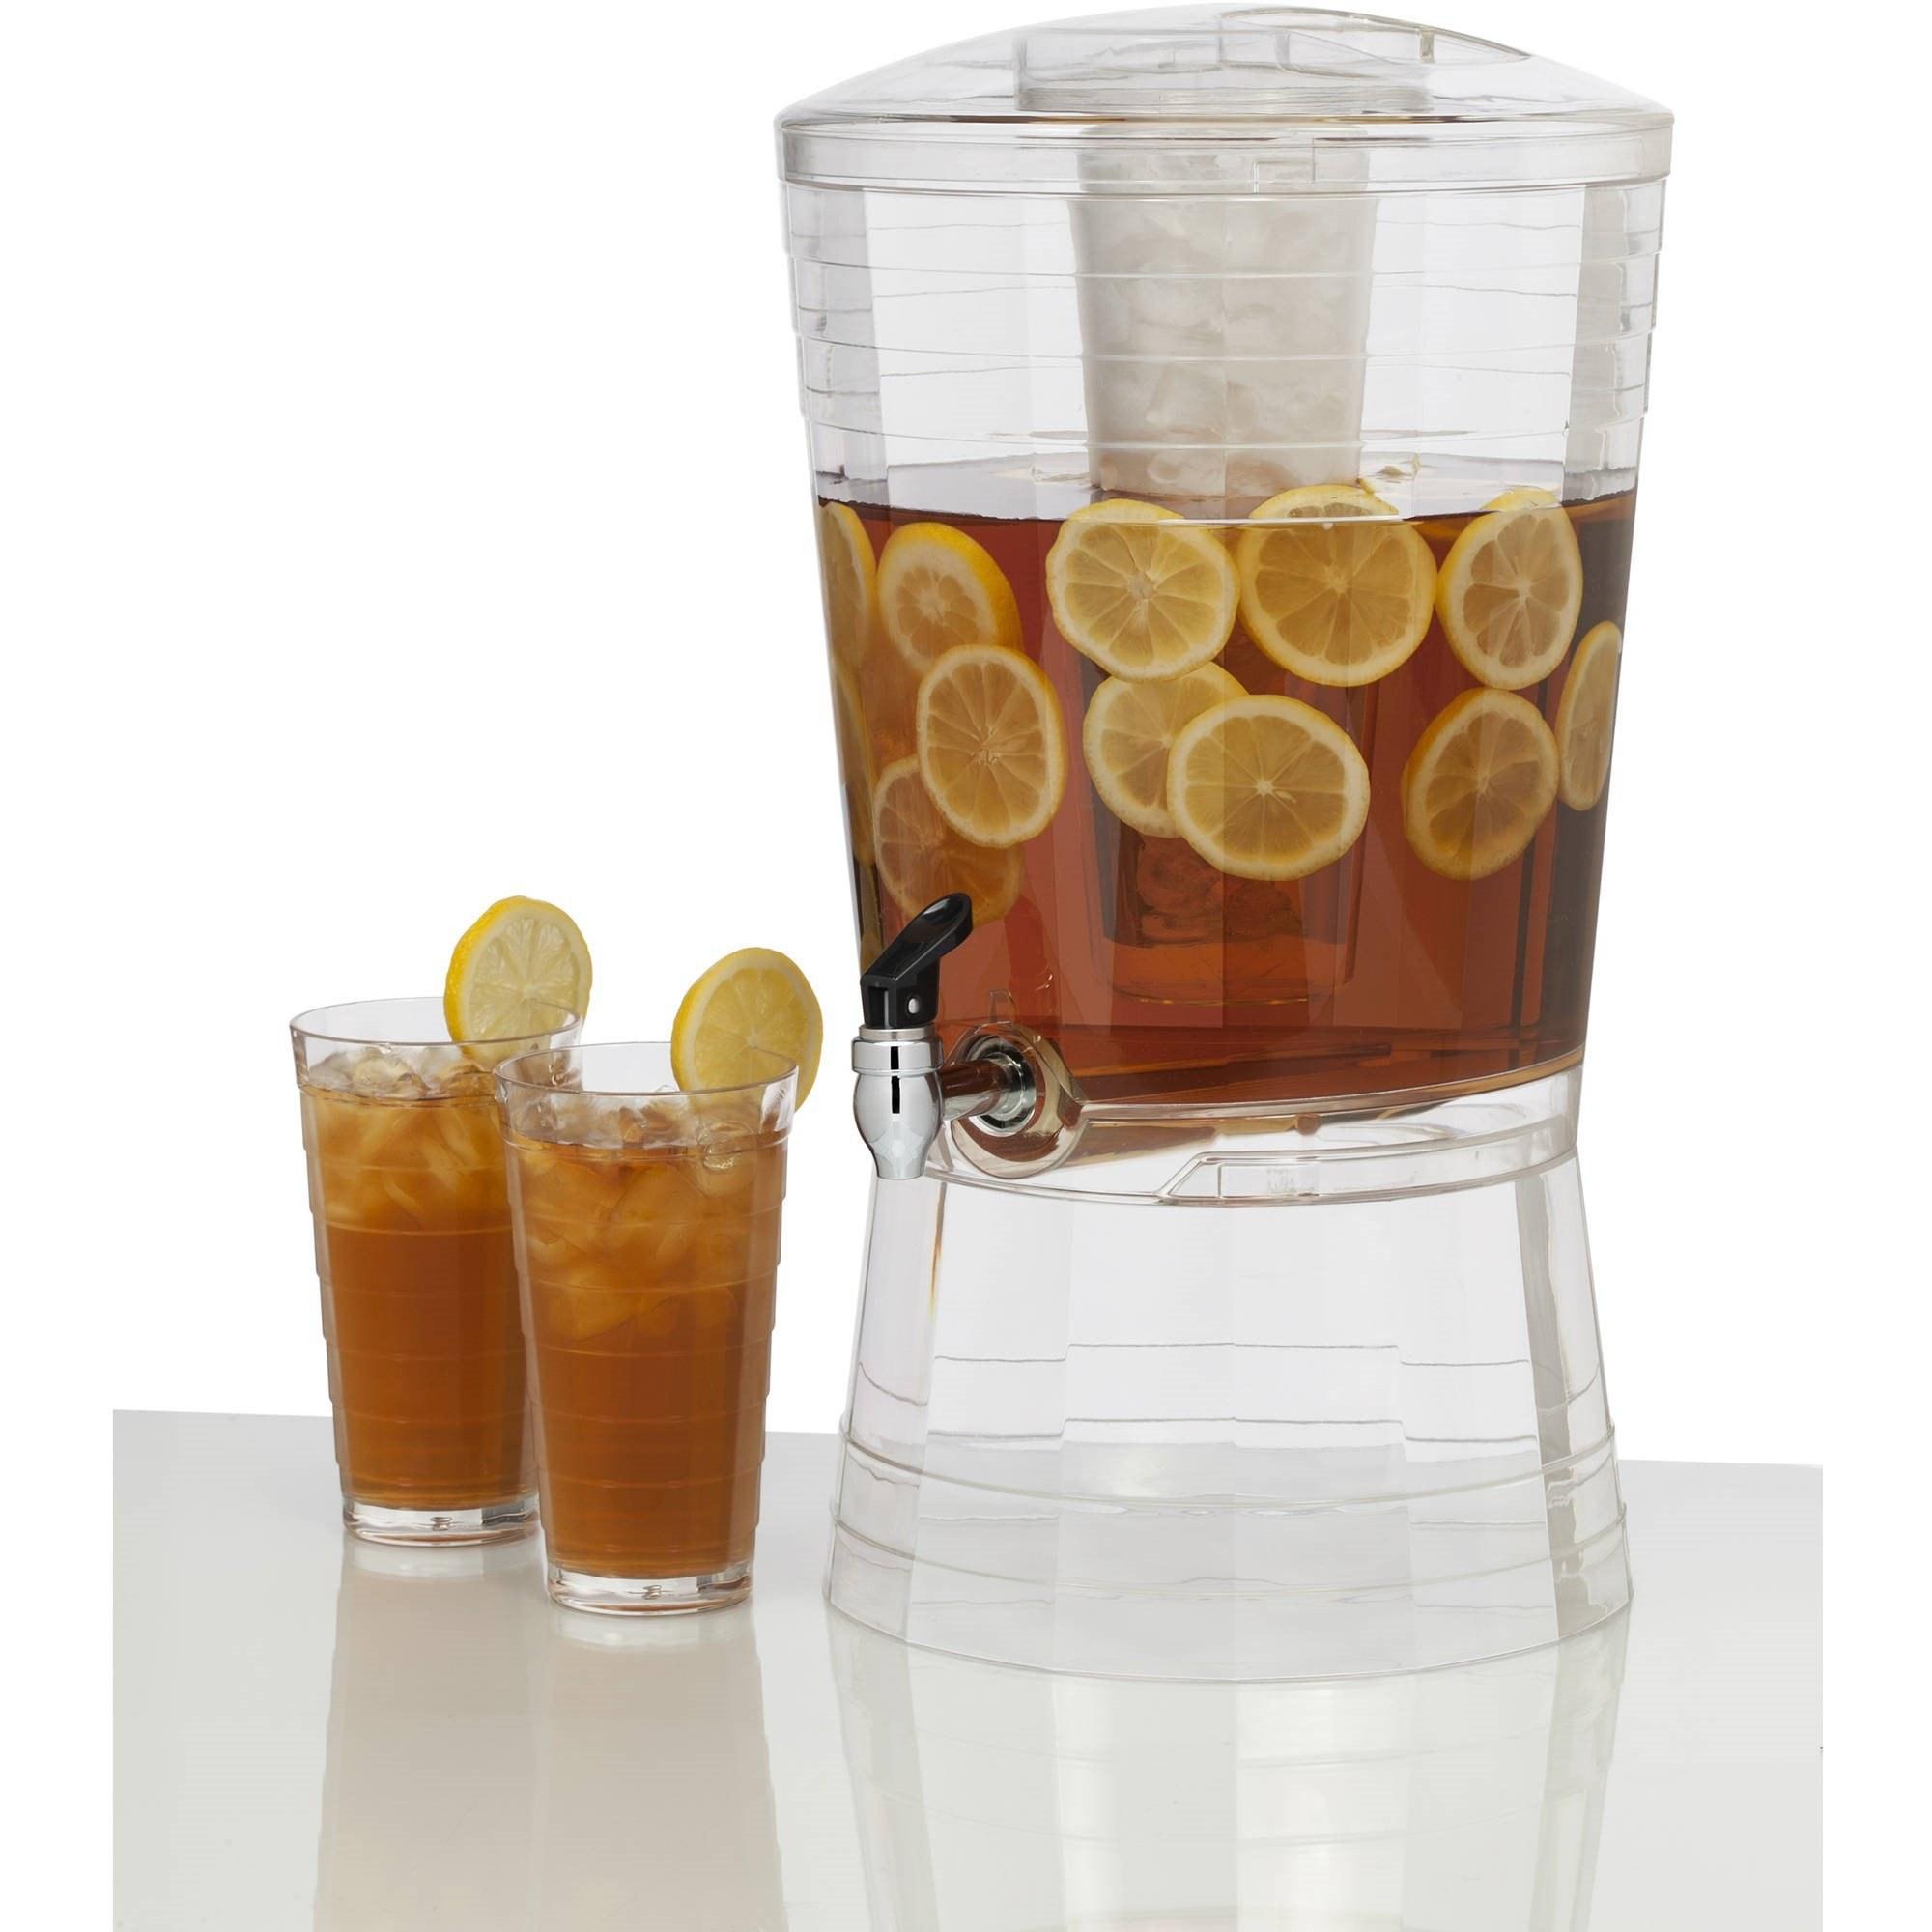 the beverage dispenser